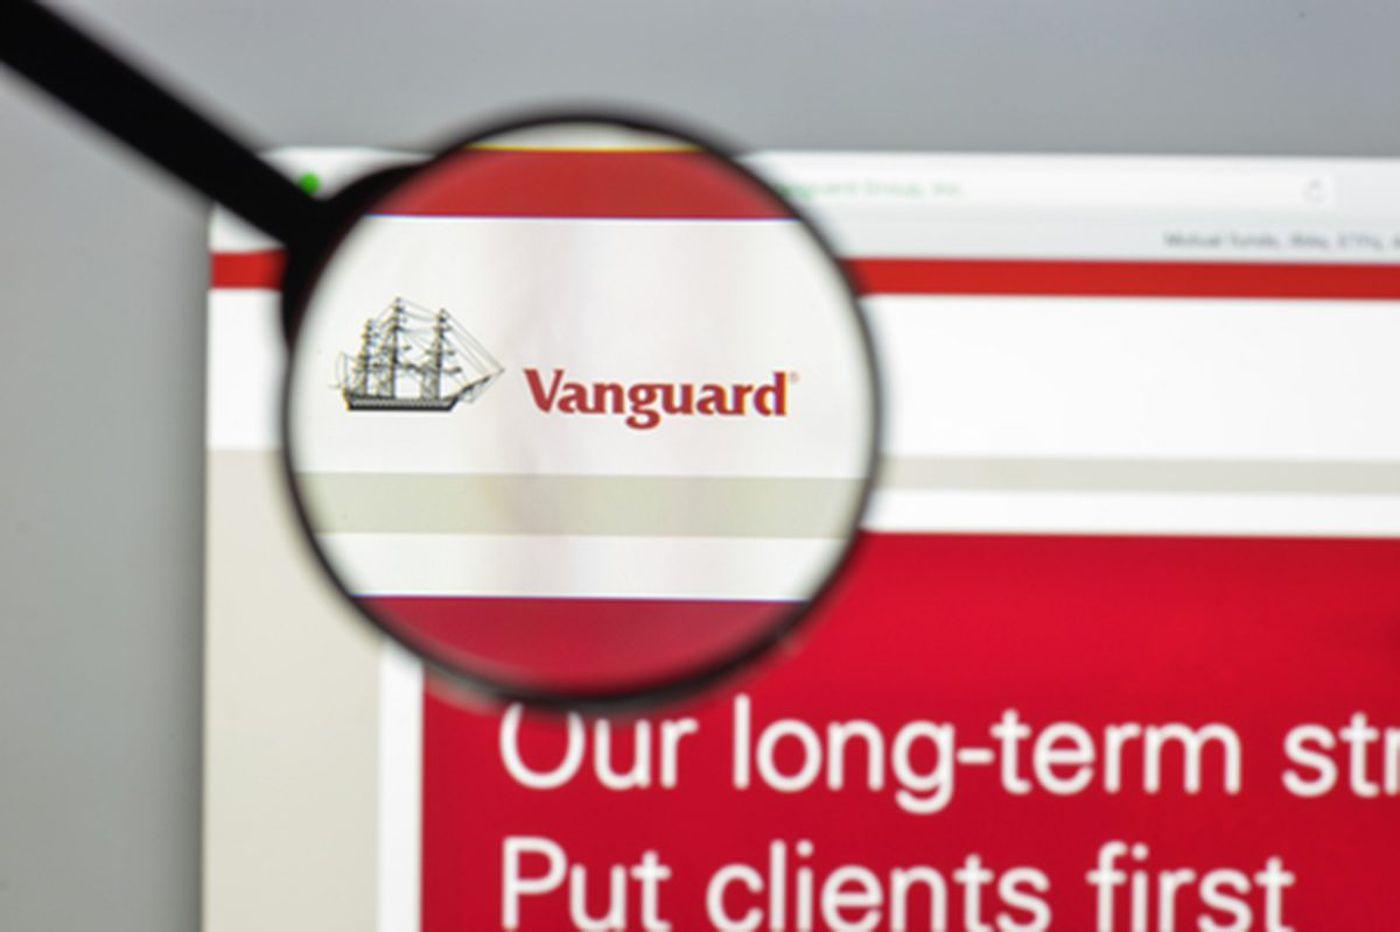 Vanguard's hybrid robo-advisor creates Amazon-like fear